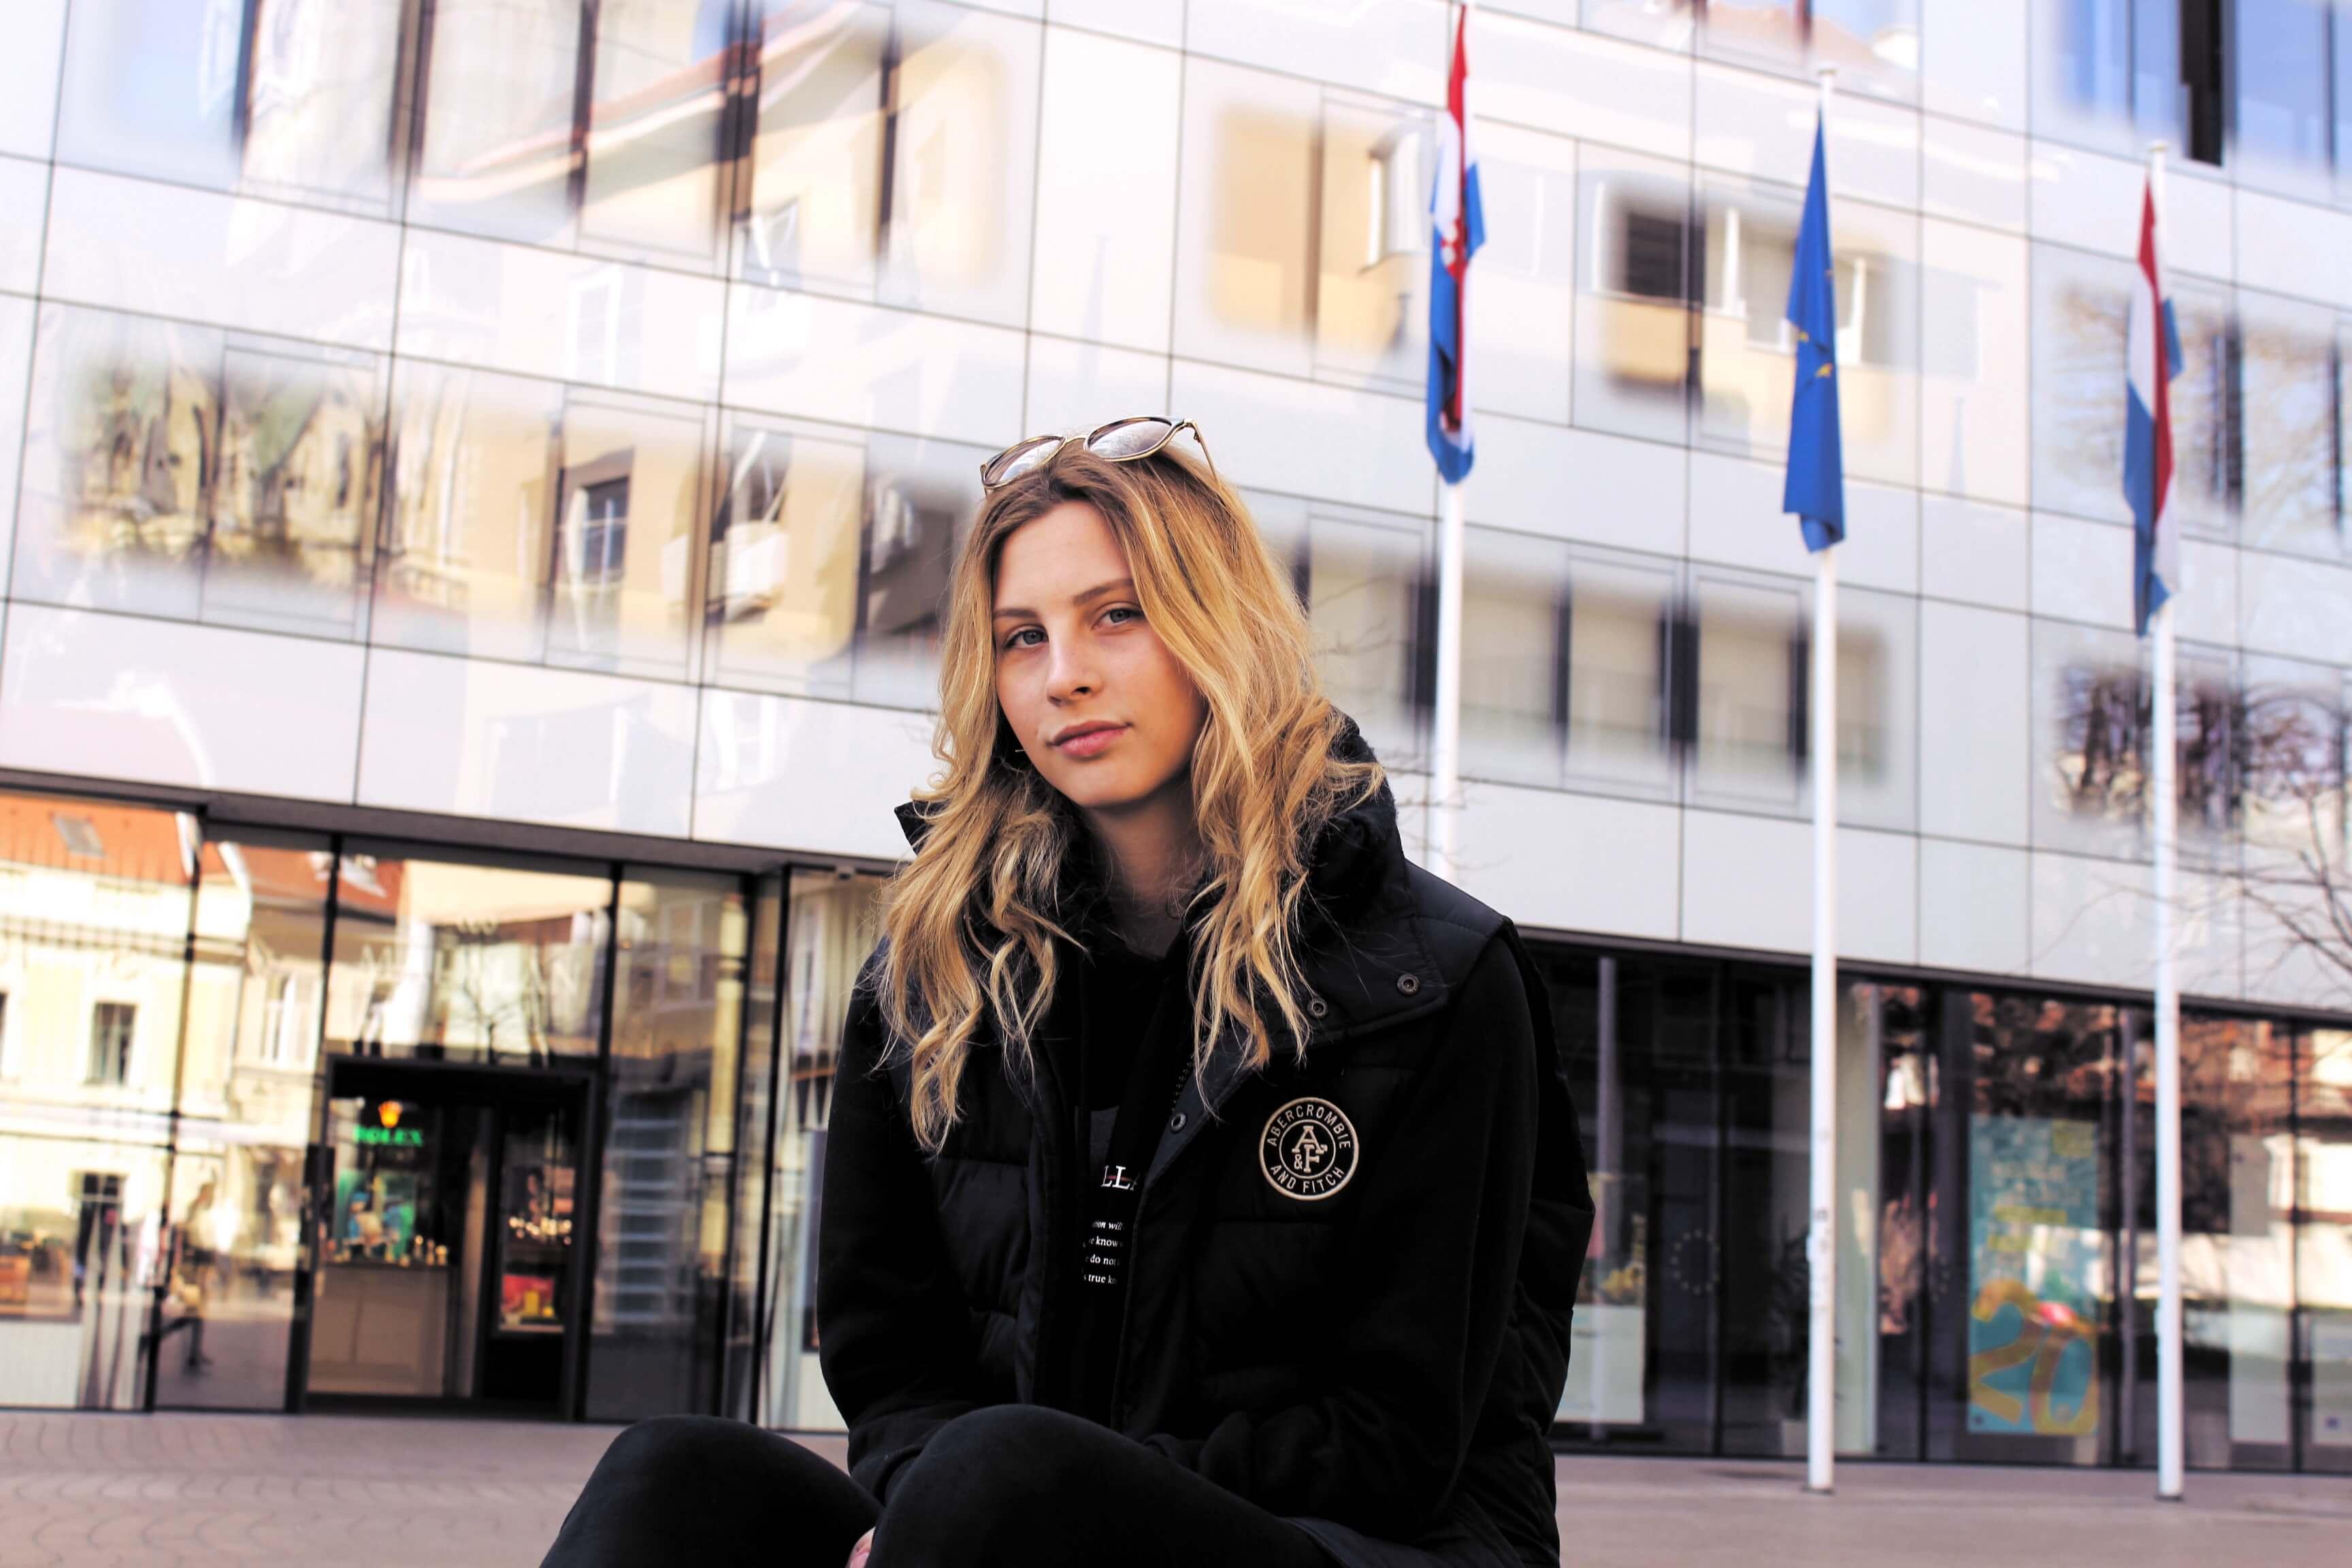 Laura Skala